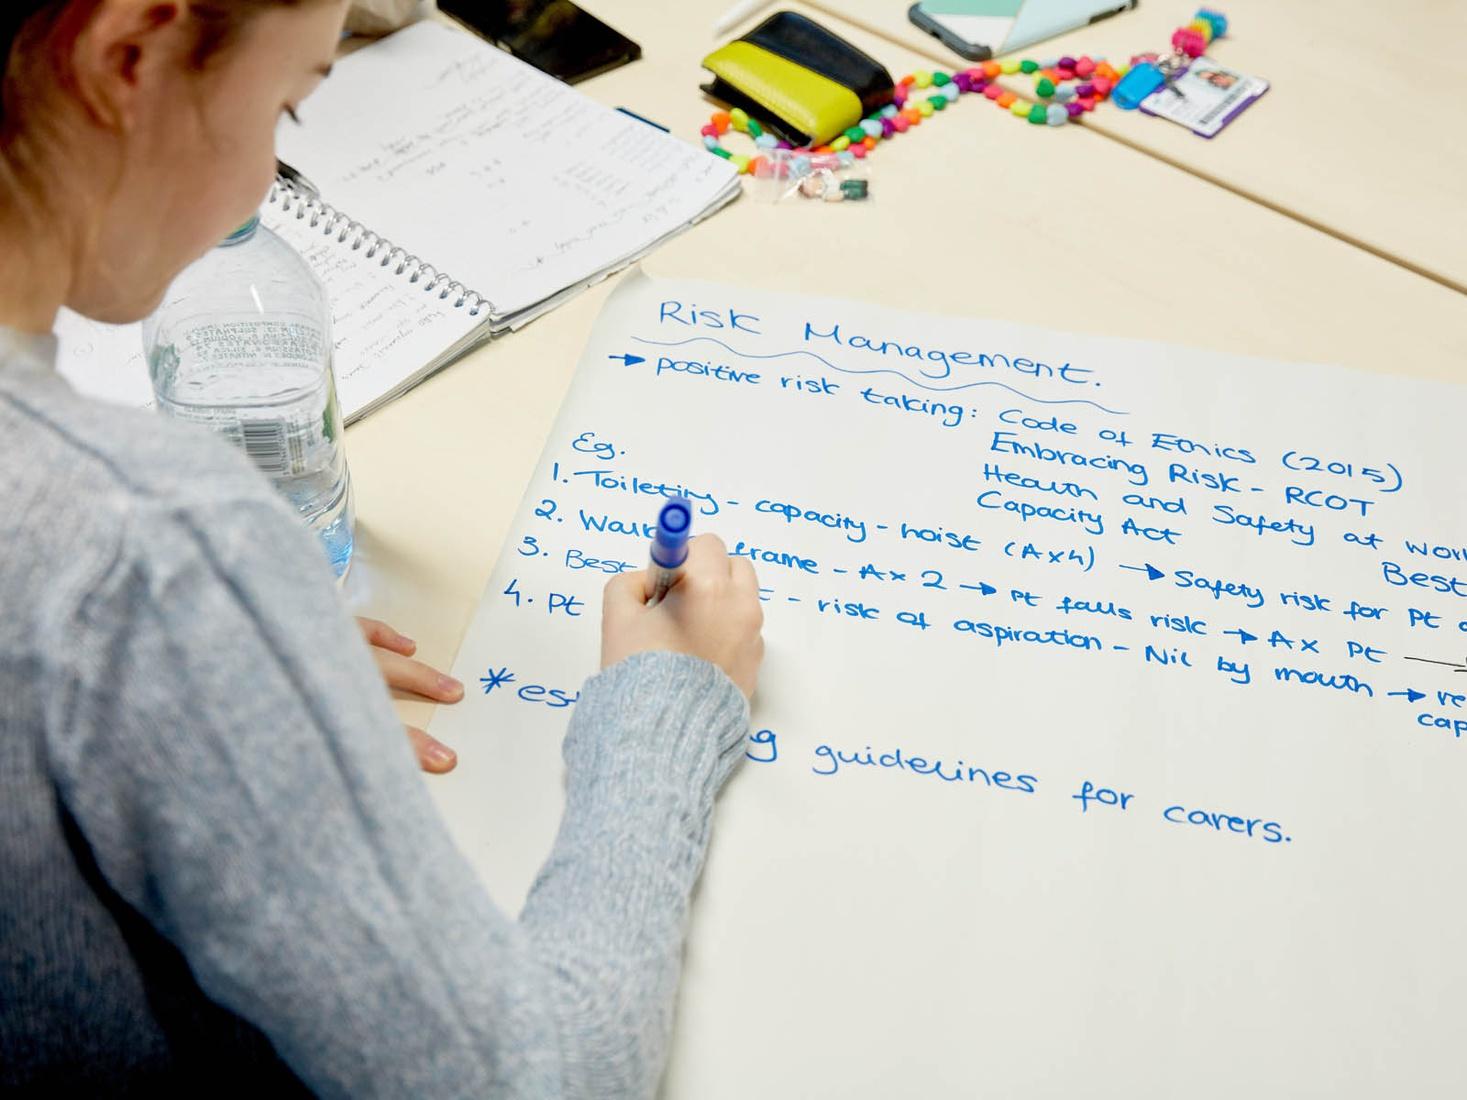 Student making notes on risk assessment